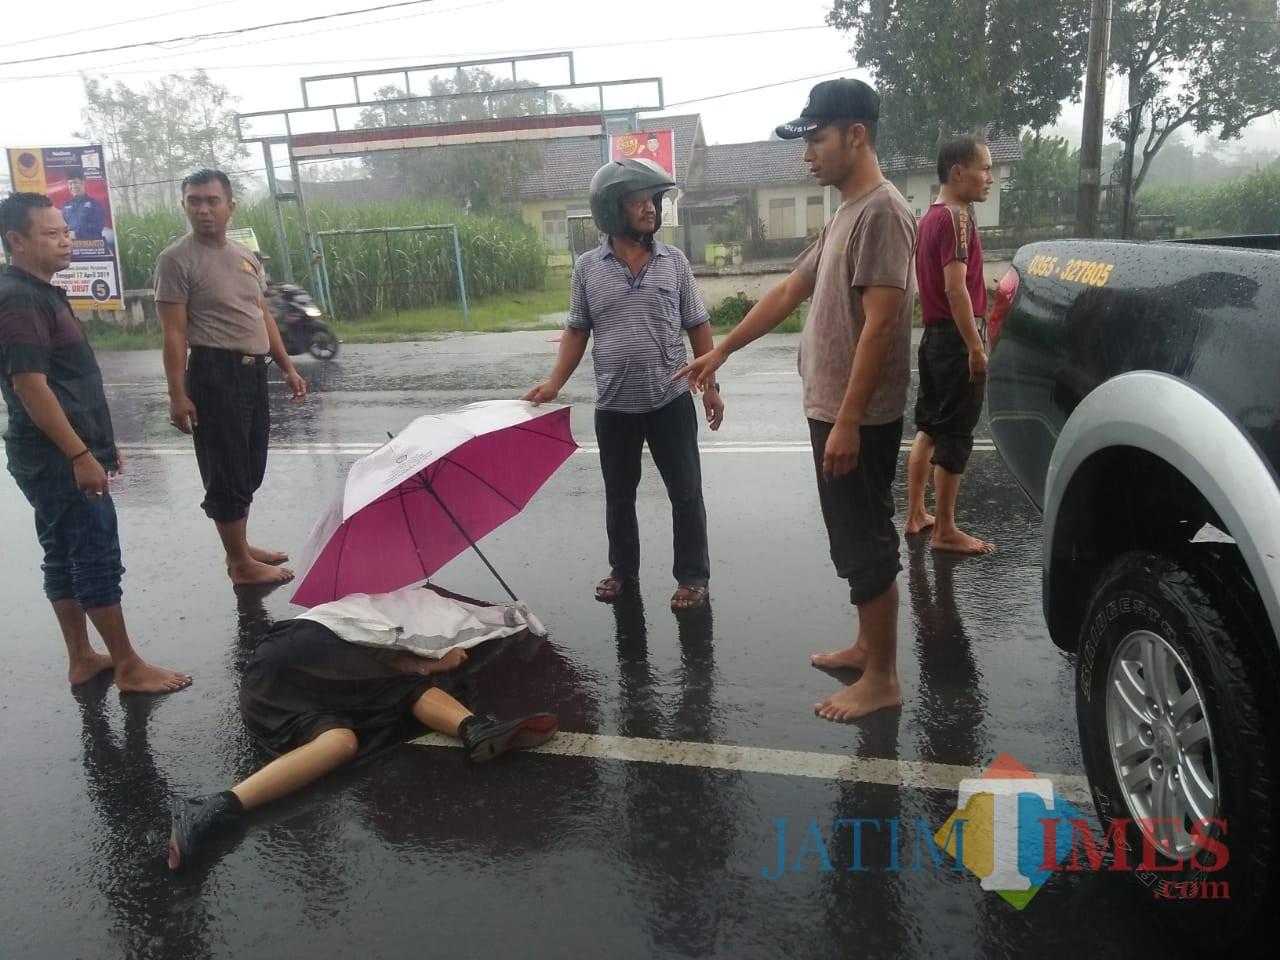 Satu korban yang diketahui bernama Sukma meninggal dunia di TKP / Foto : Dokpol / Tulungagung TIMES